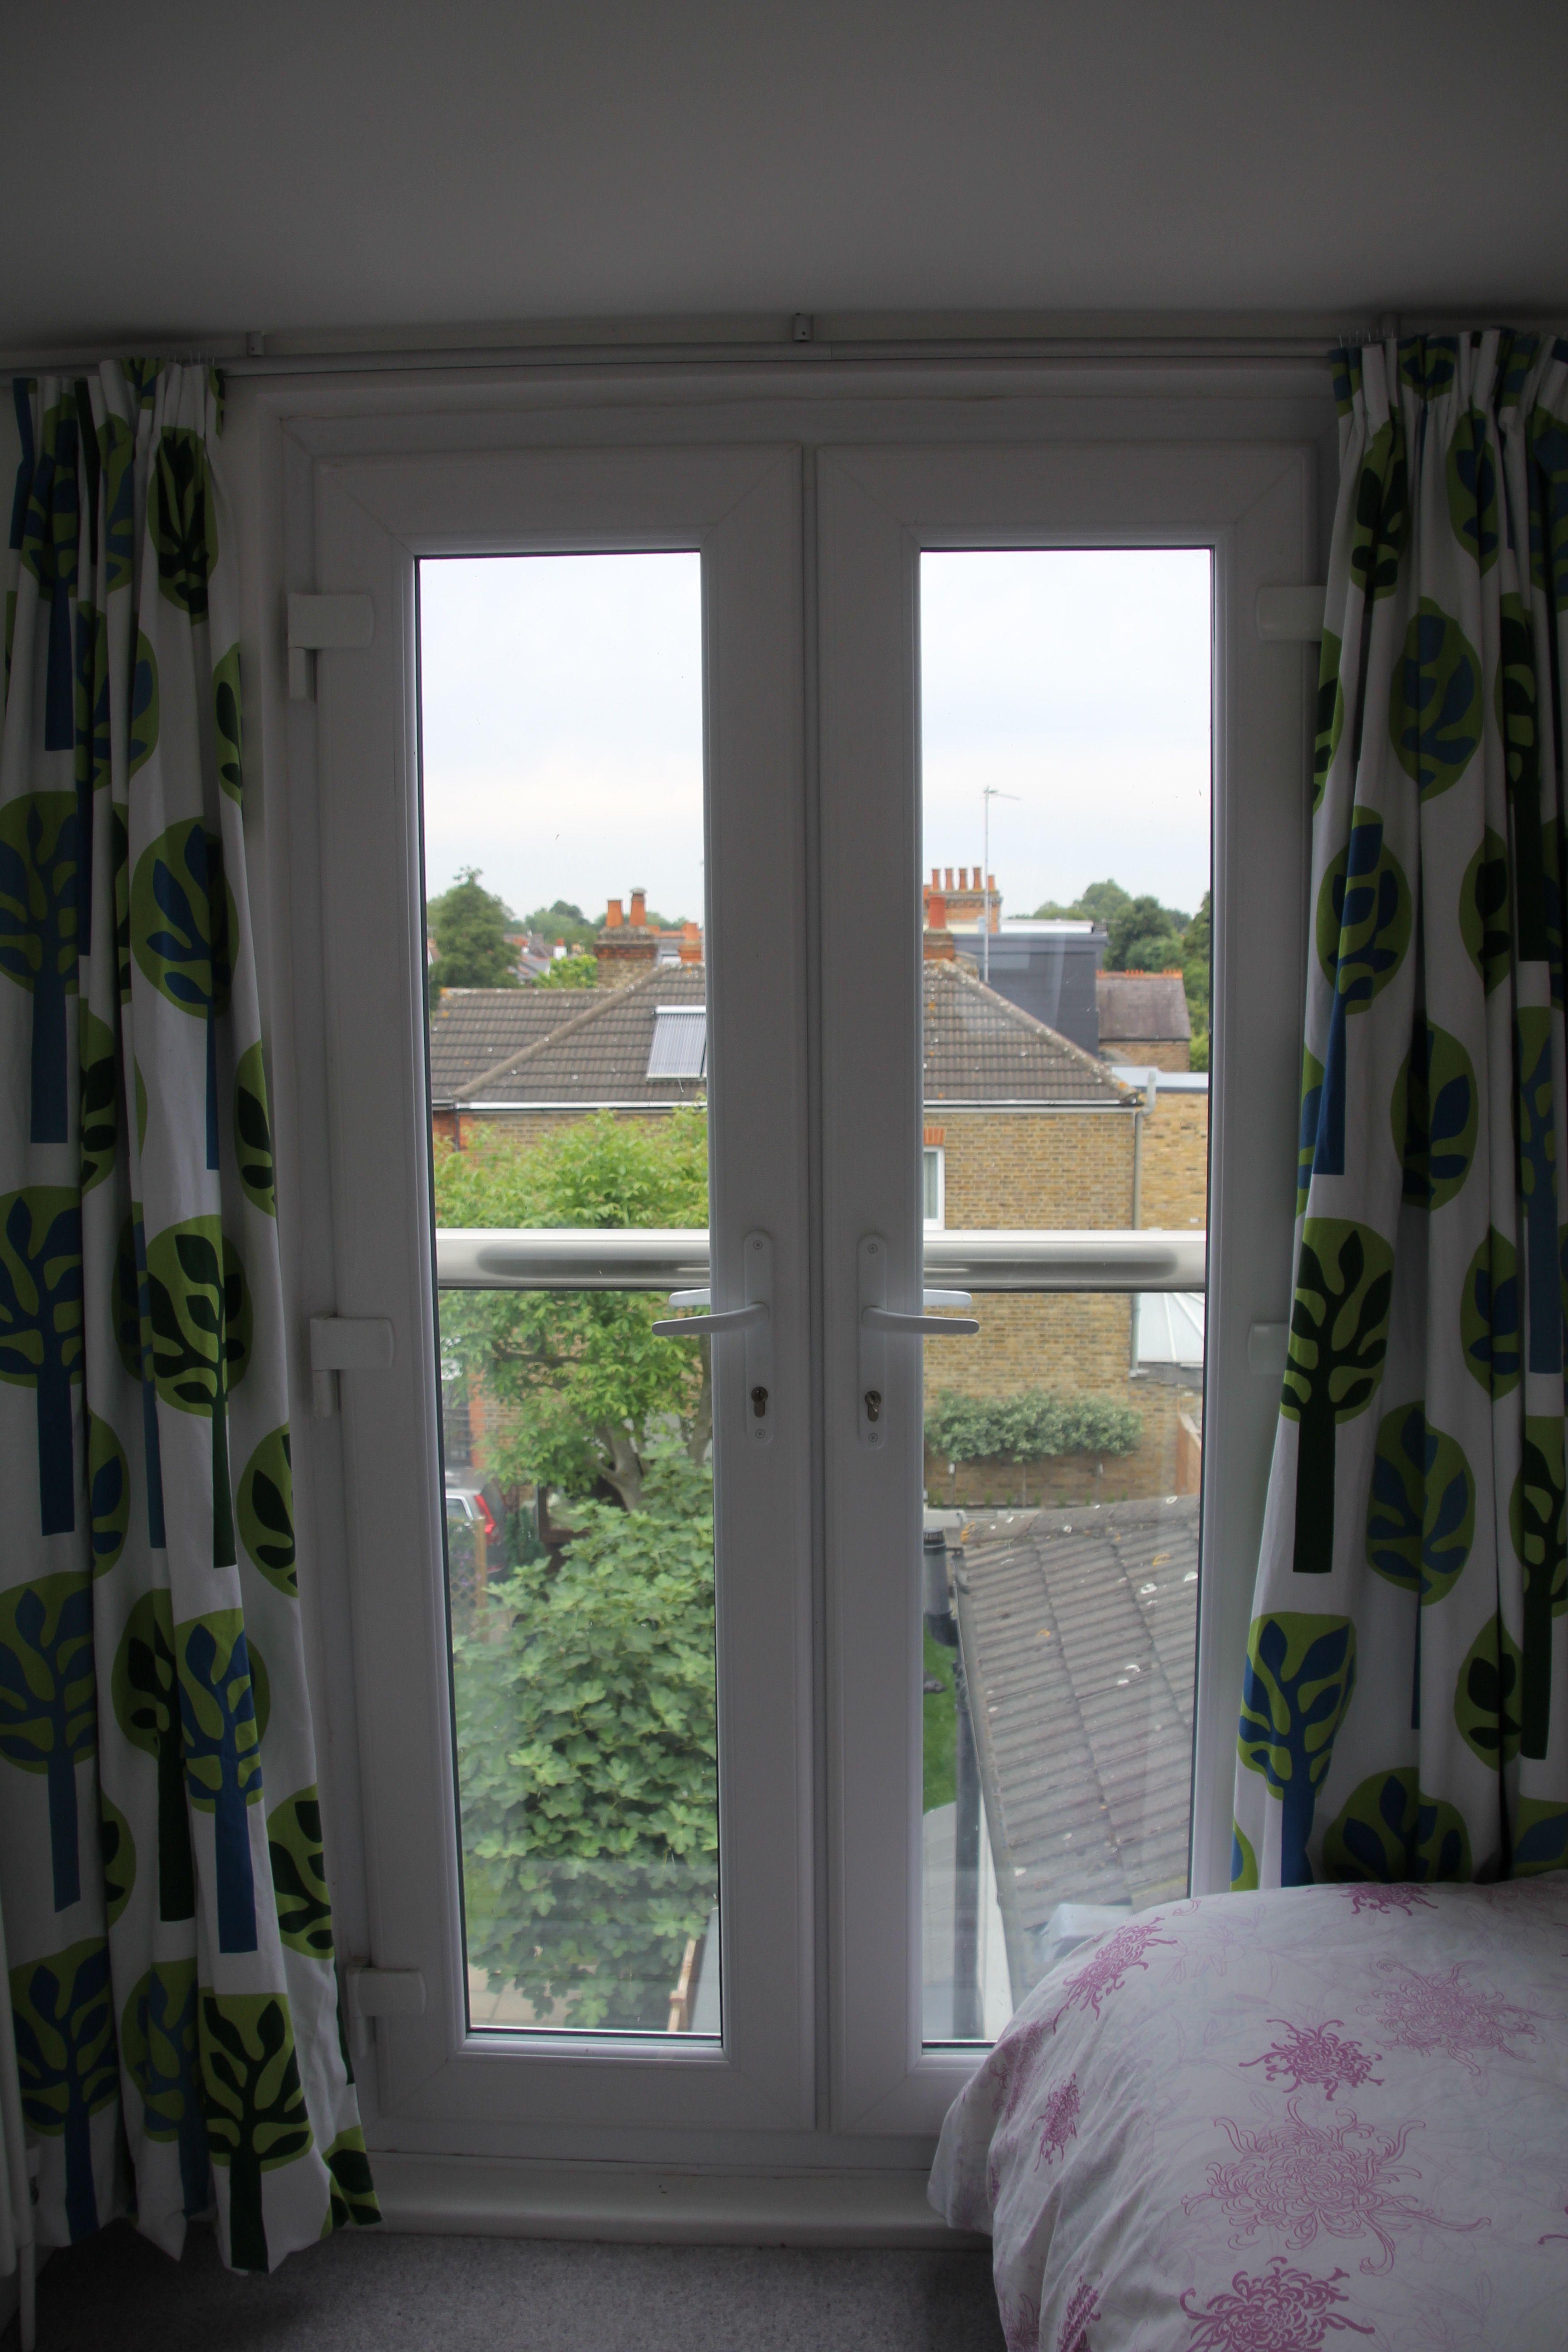 Loft bedroom images  Juliet balcony in the loft bedroom   Kingston Road Post